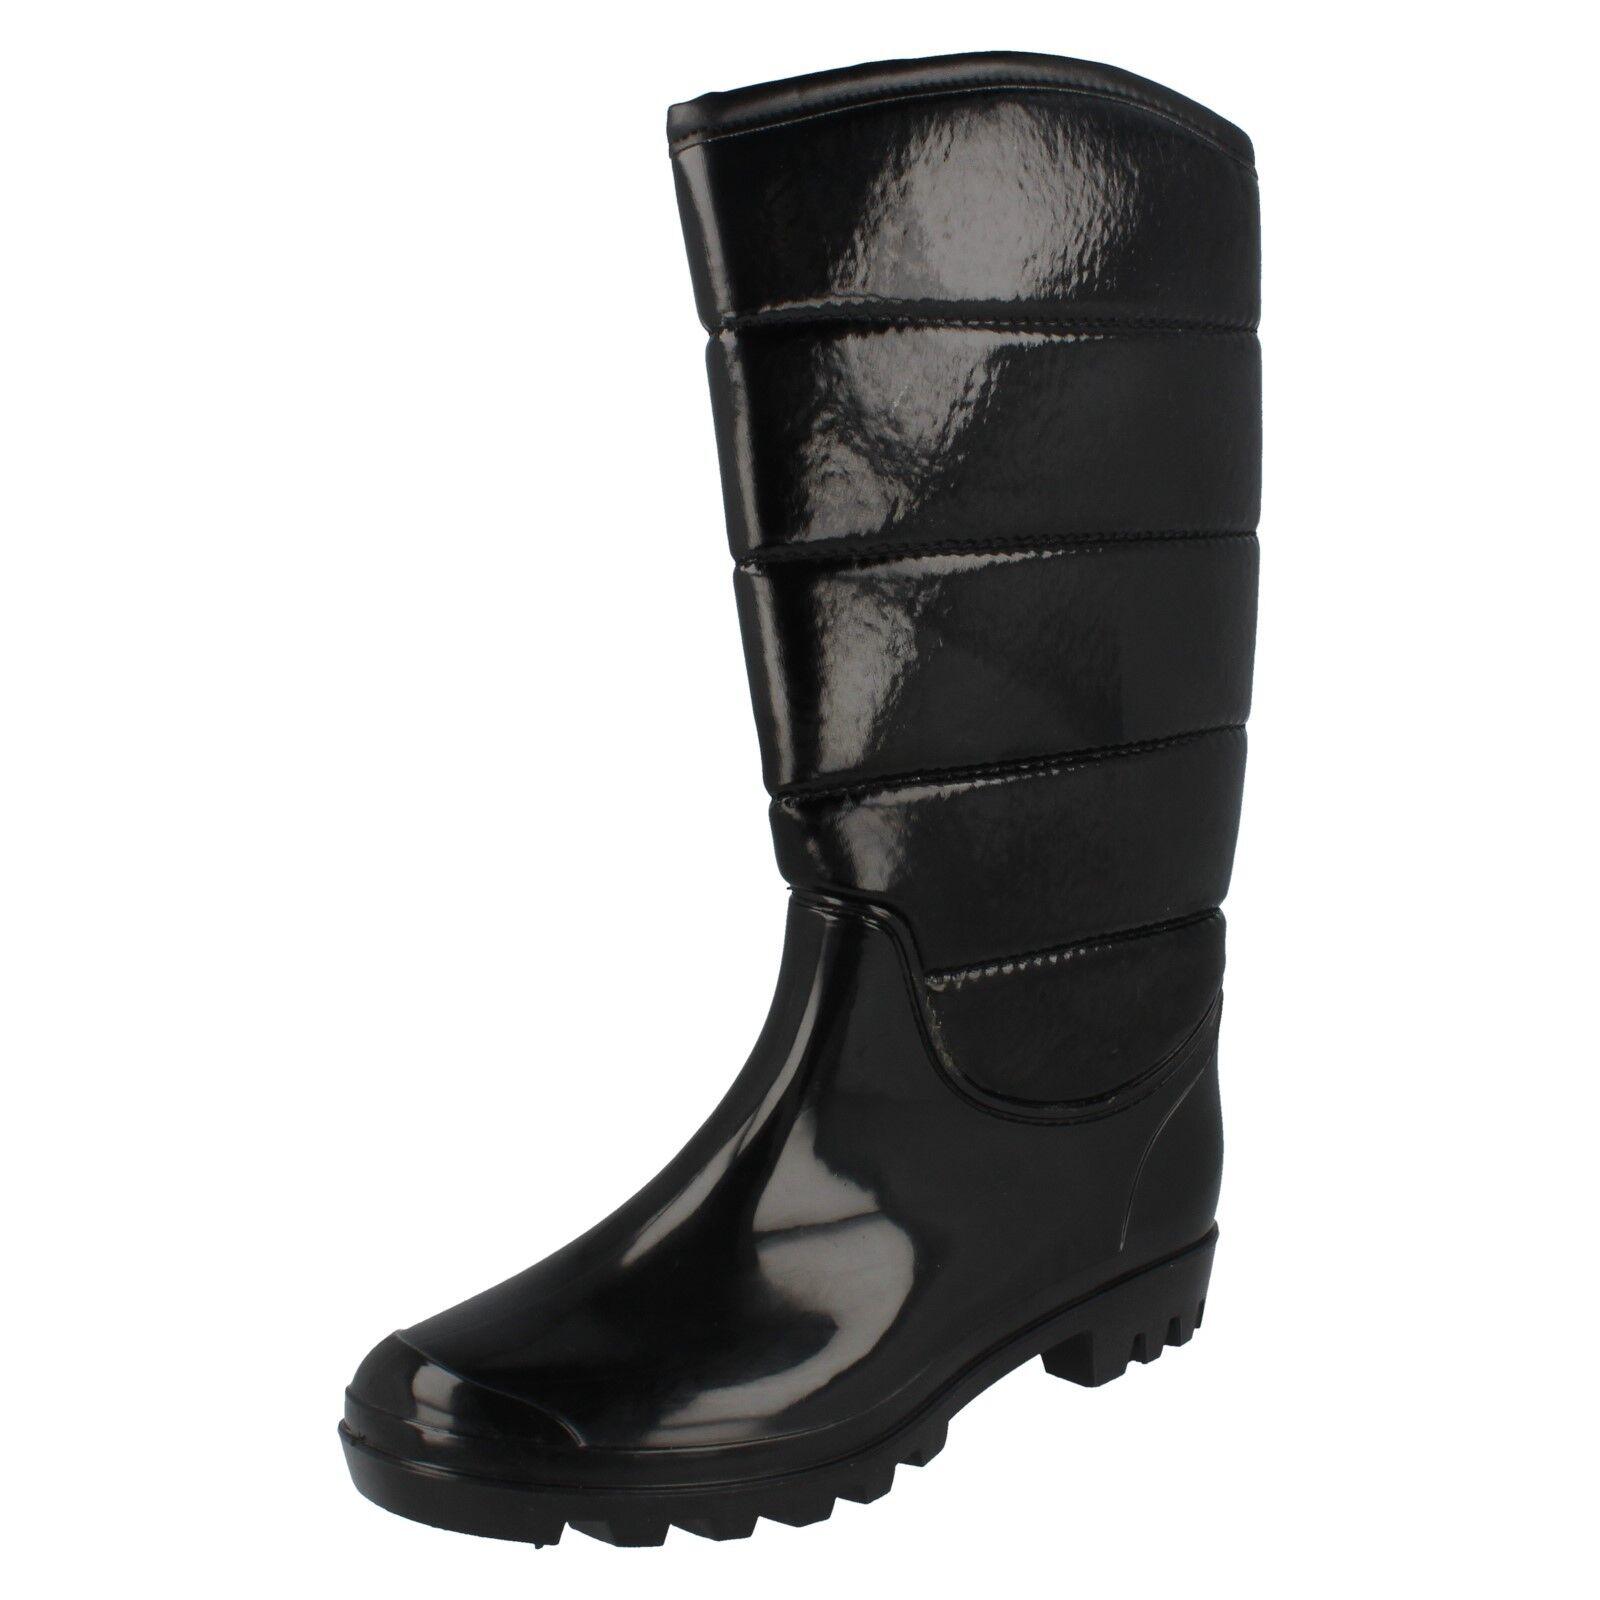 Ladies X1132 black patent/synthet<wbr/>ic  padded wellington boots